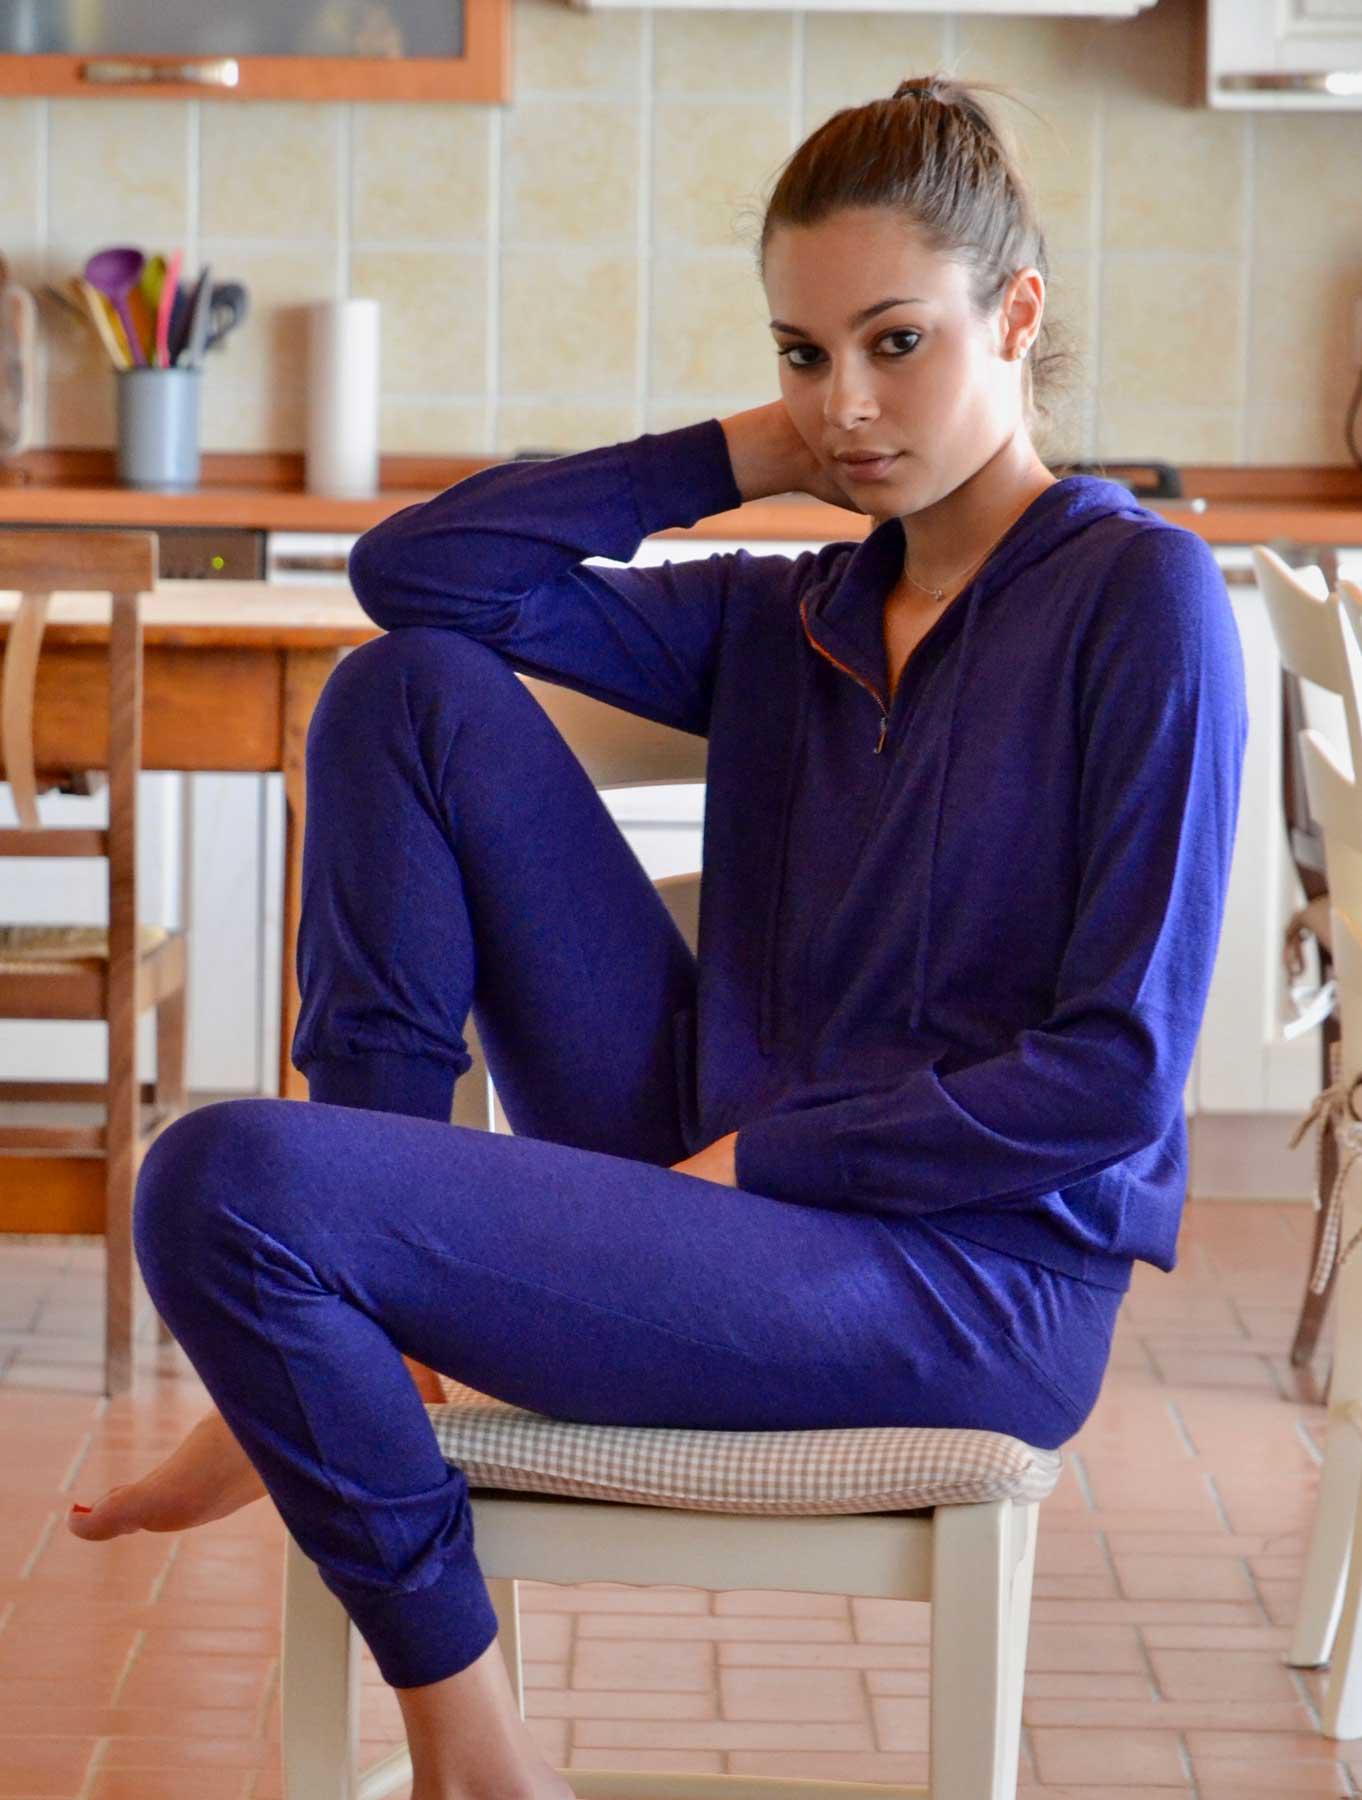 matteo-perin-women-clothing-dress-010.jpg